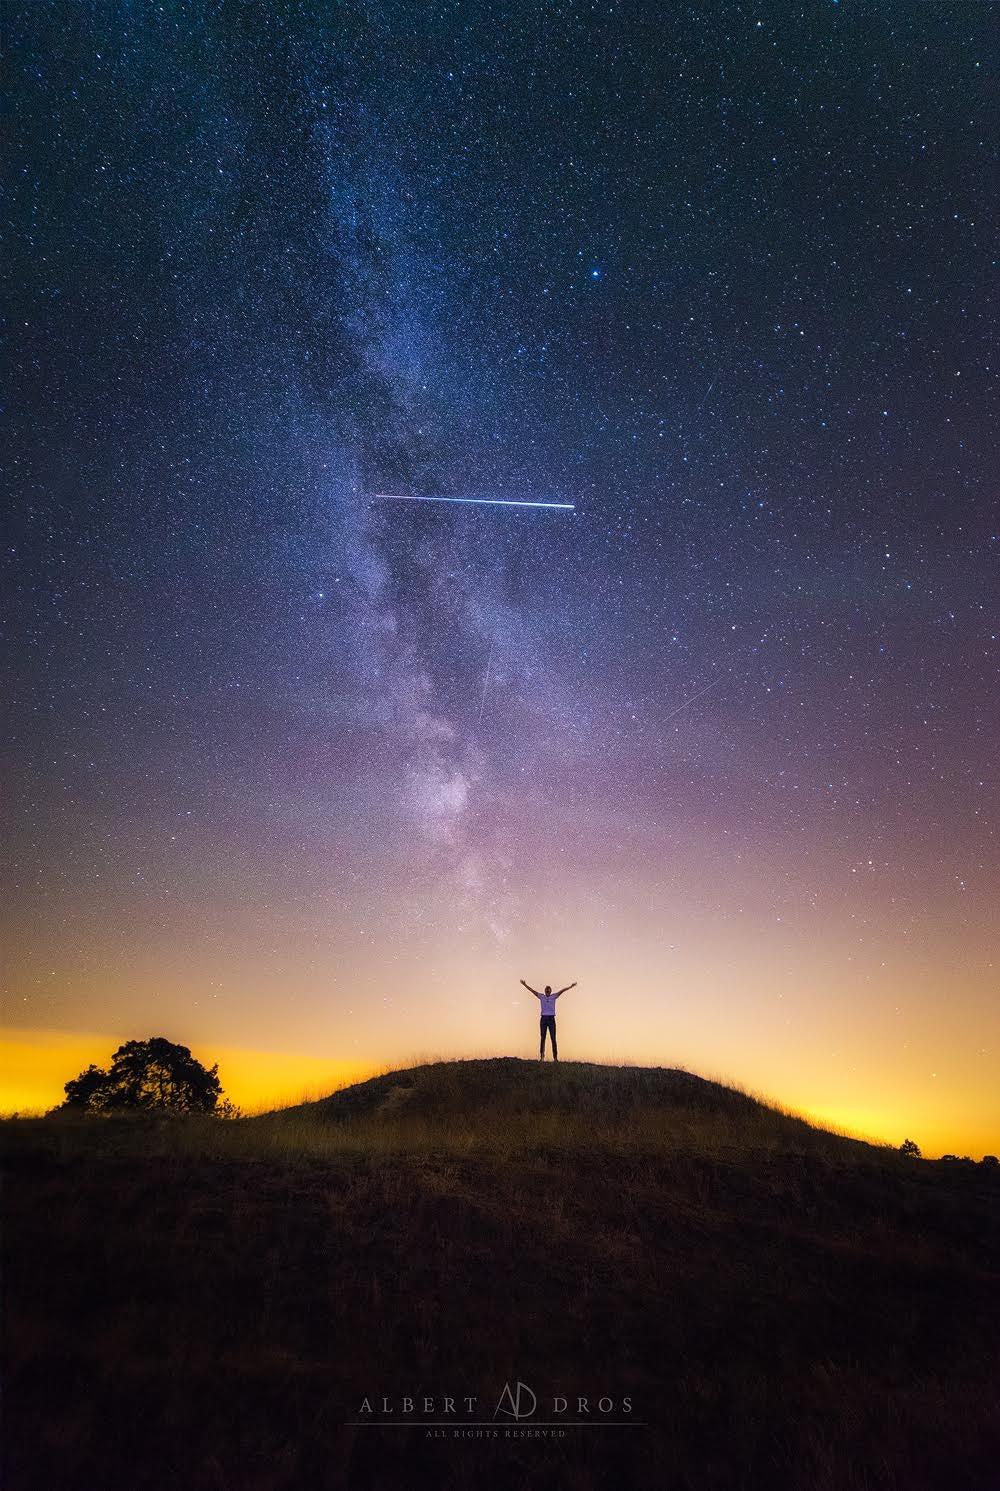 Are we alone in the universe essay